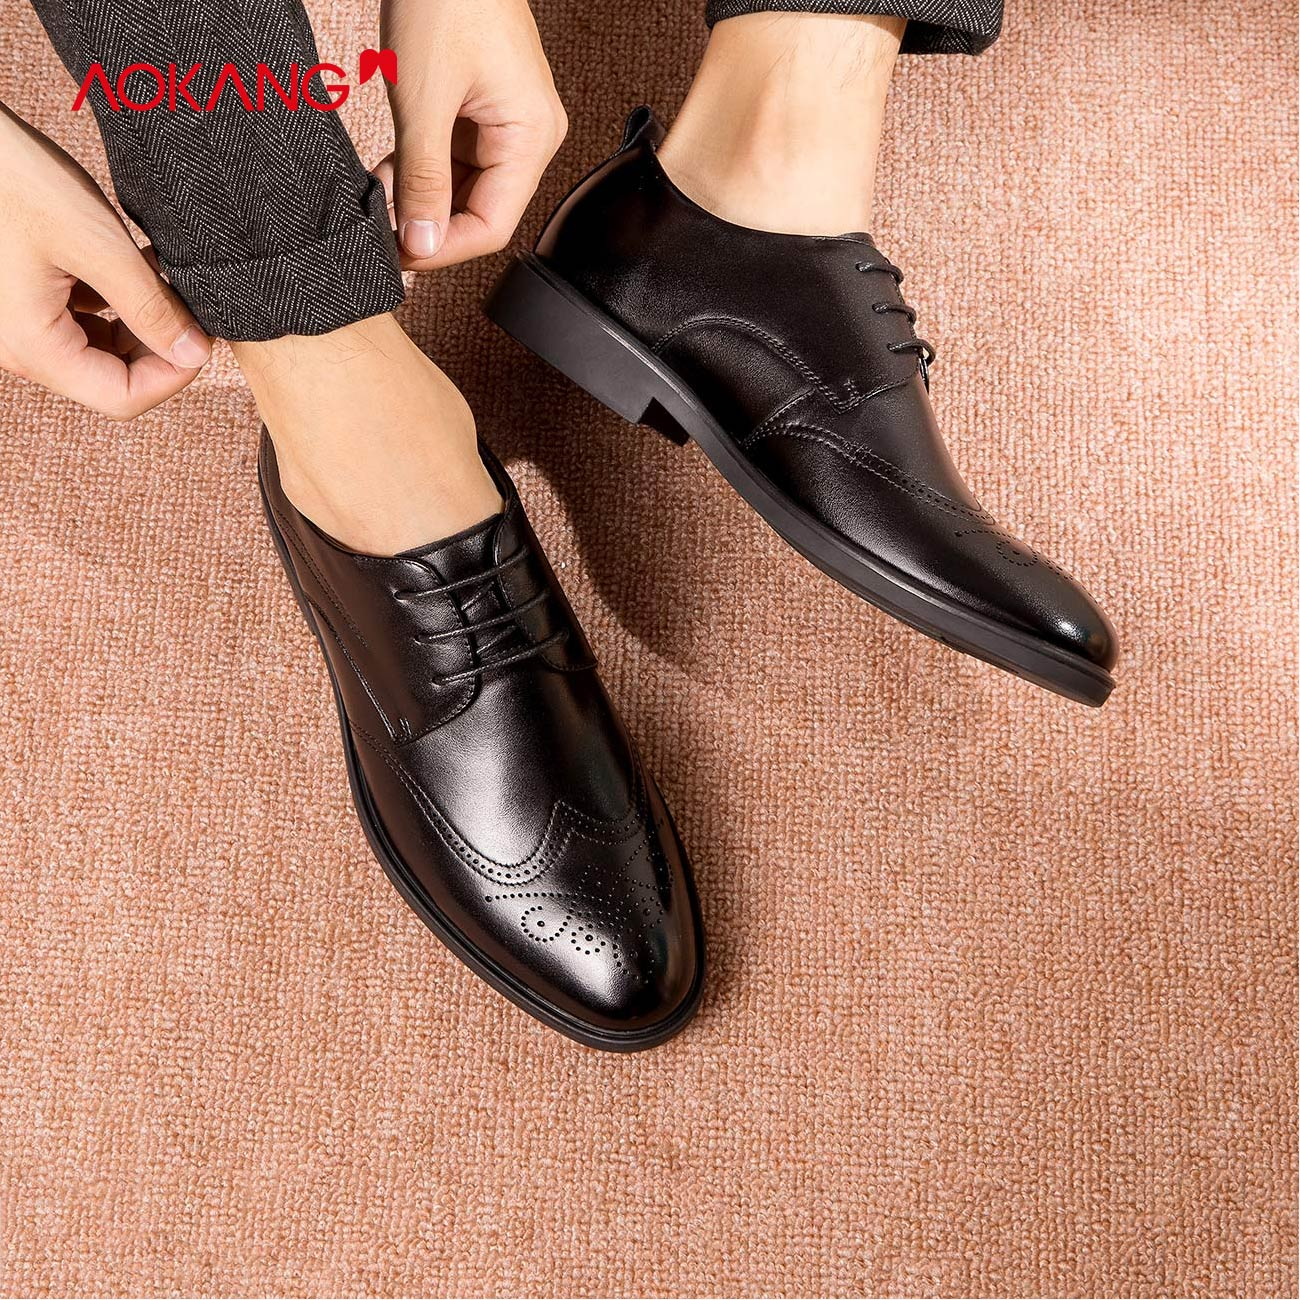 Мужские туфли / Полуботинки Артикул 598931345701